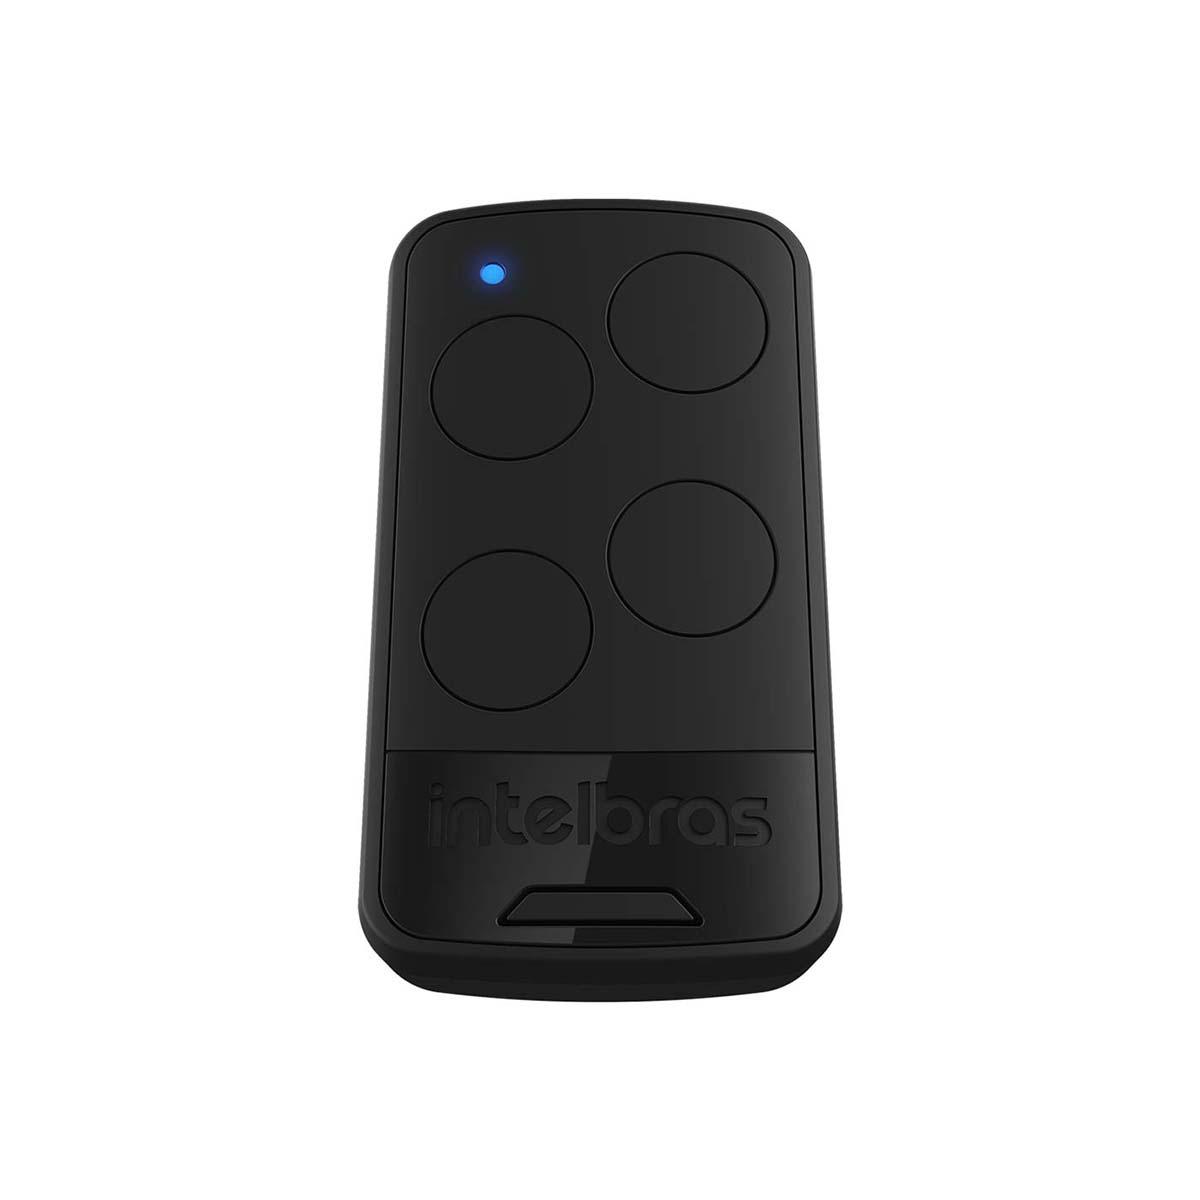 Kit 03 Controle Remoto Ep 04 Intelbras